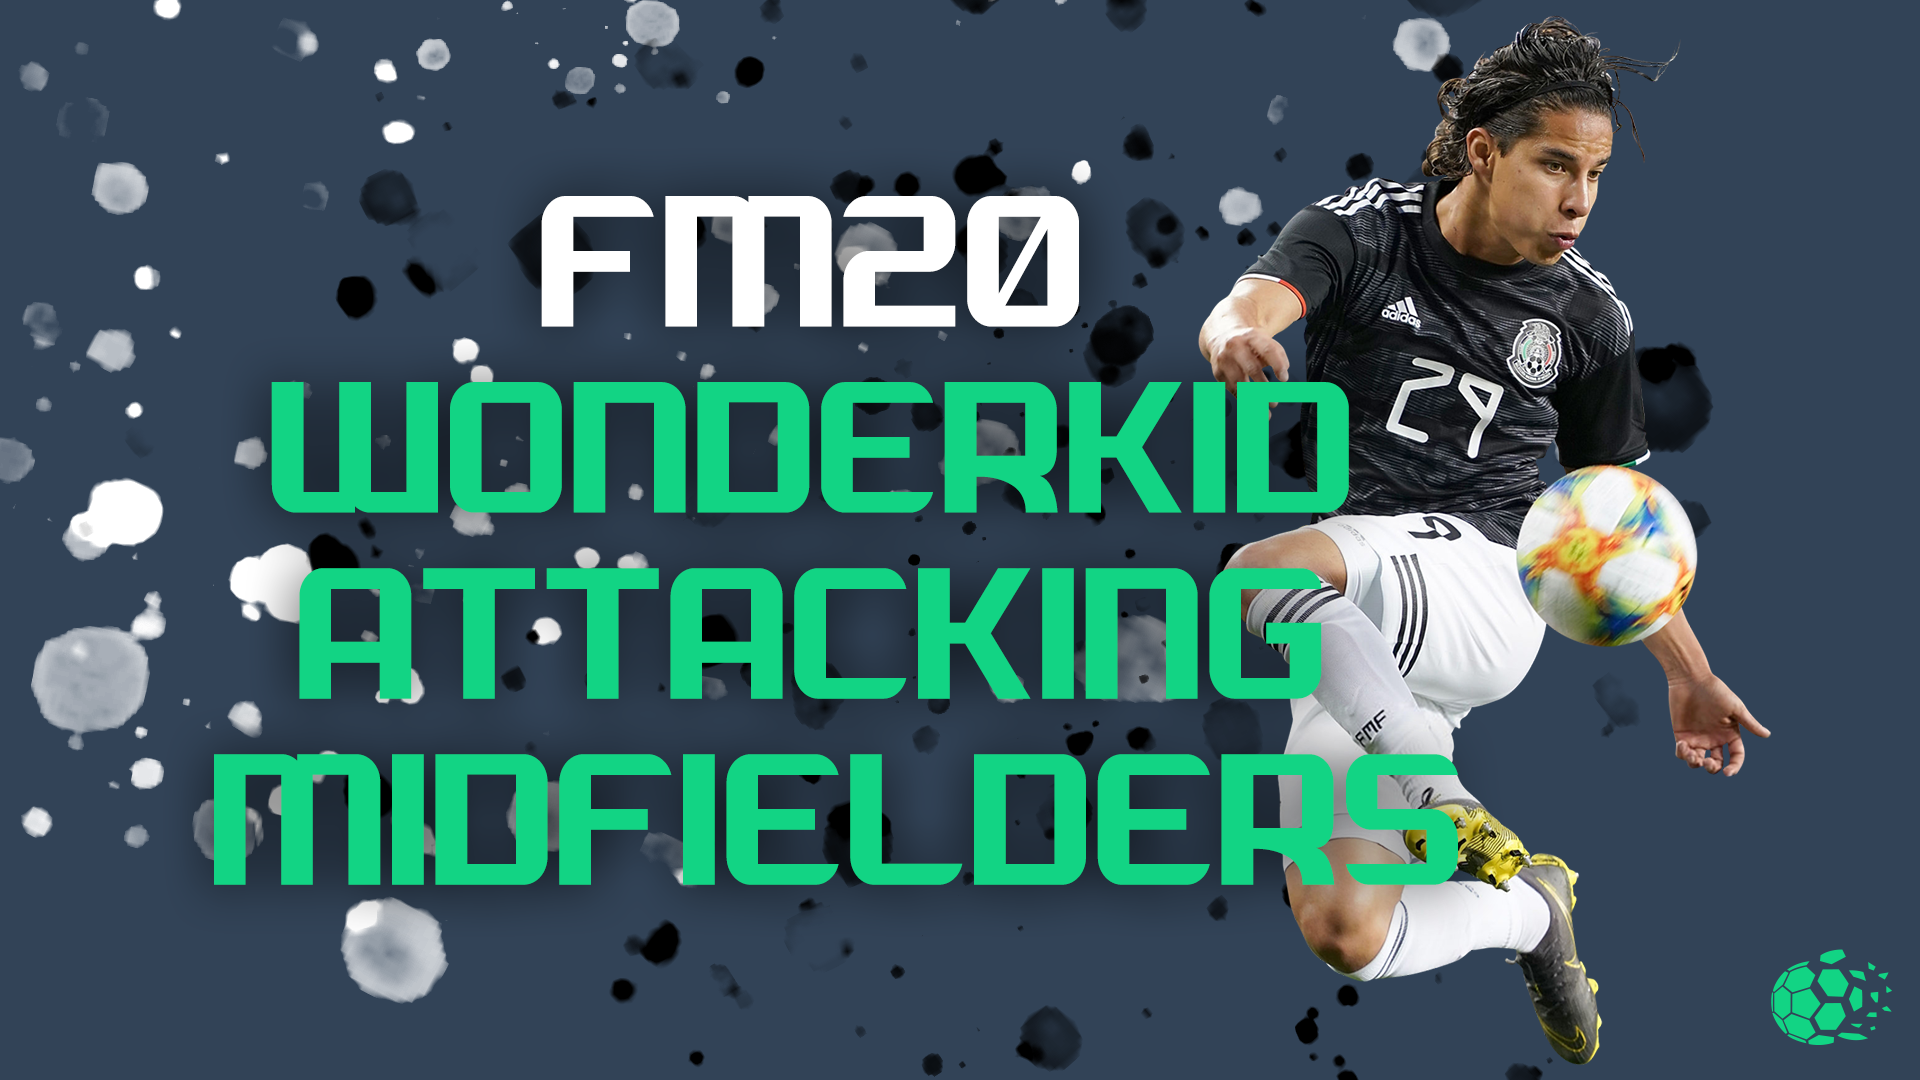 """FM20Jonny(FM)Bass' Top 10 Attacking Midfield Wonderkids"" feature image"